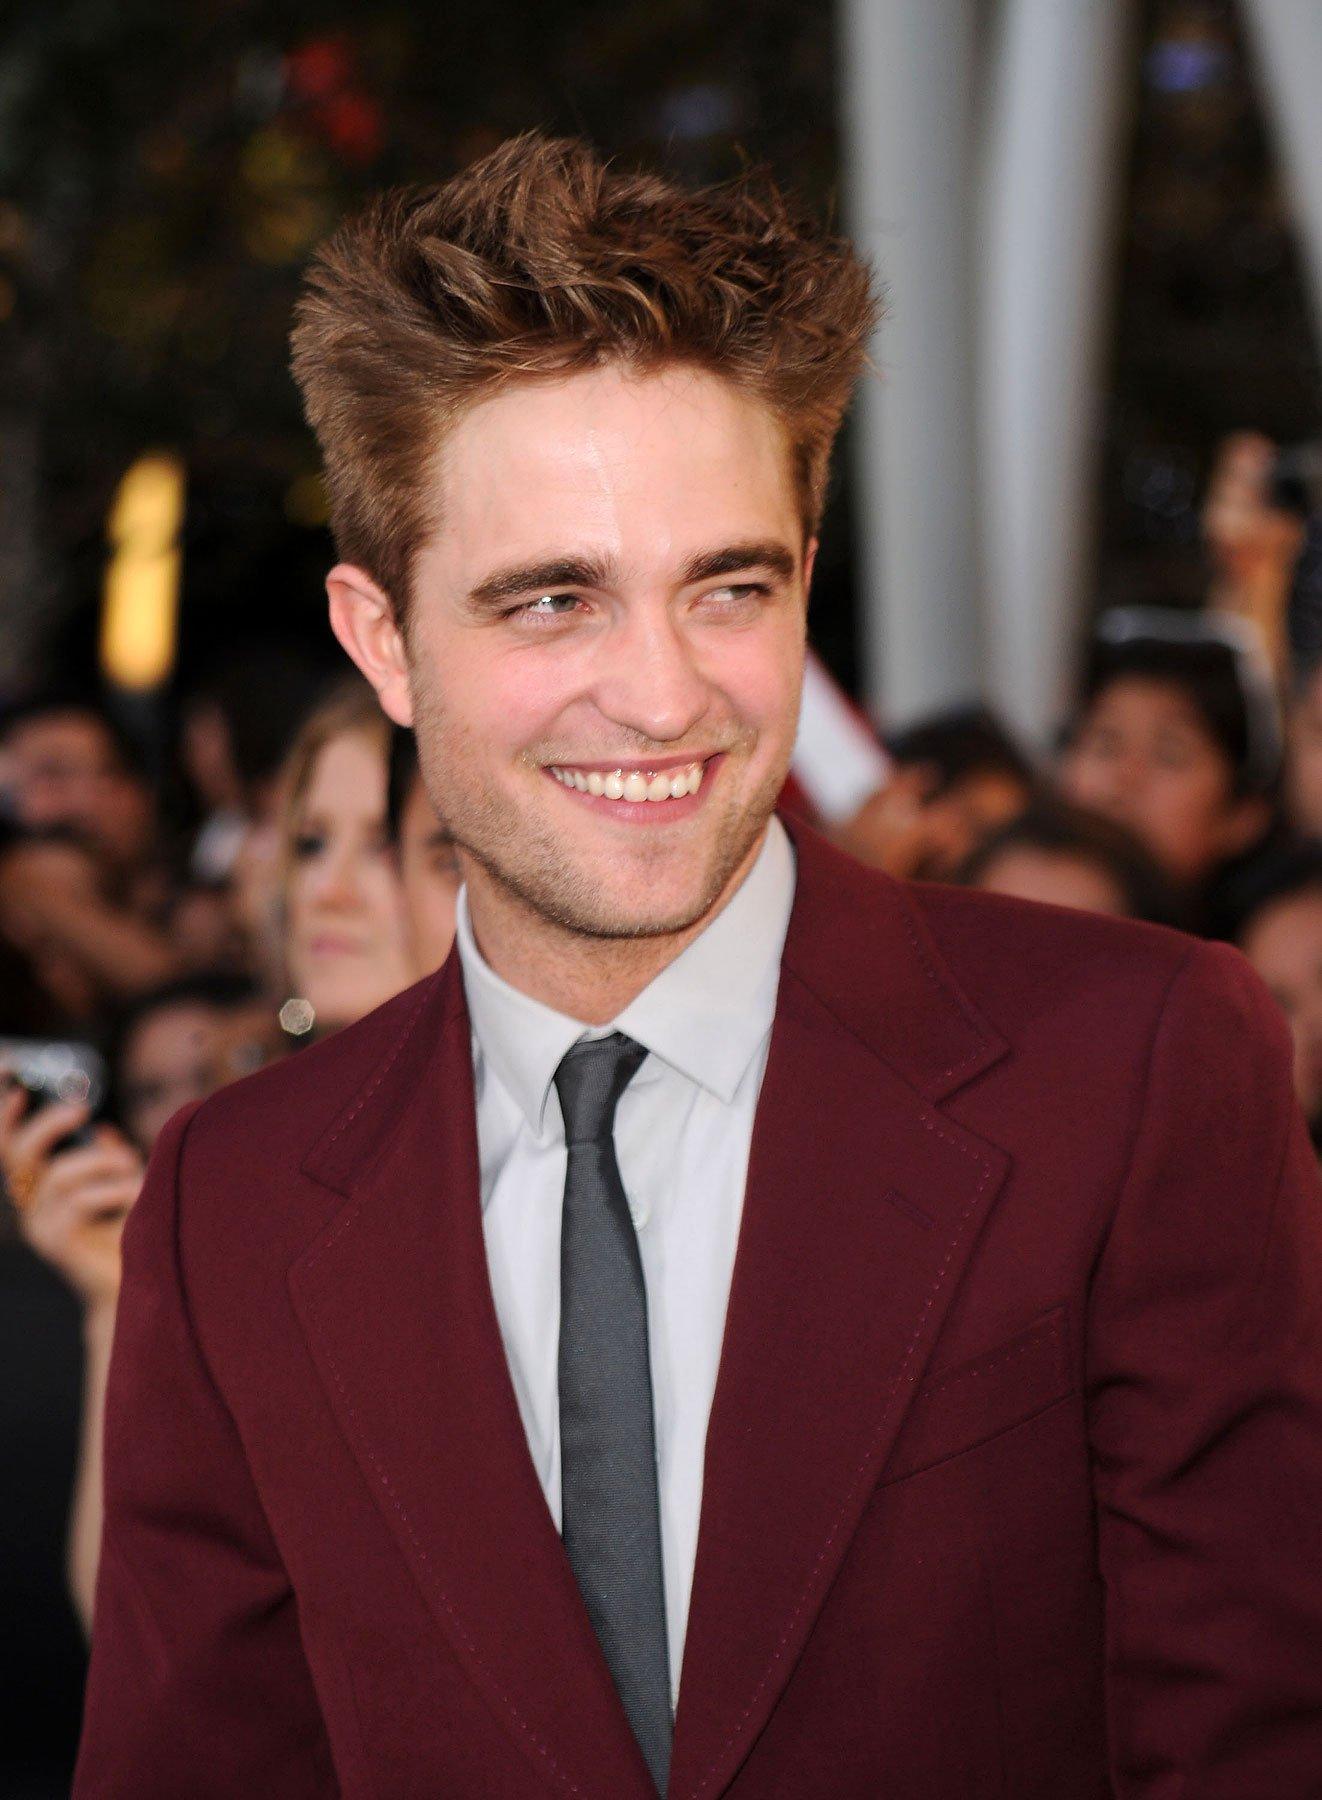 Robert Pattinson Tops Glamour 50 Sexiest Men Poll (PHOTOS)